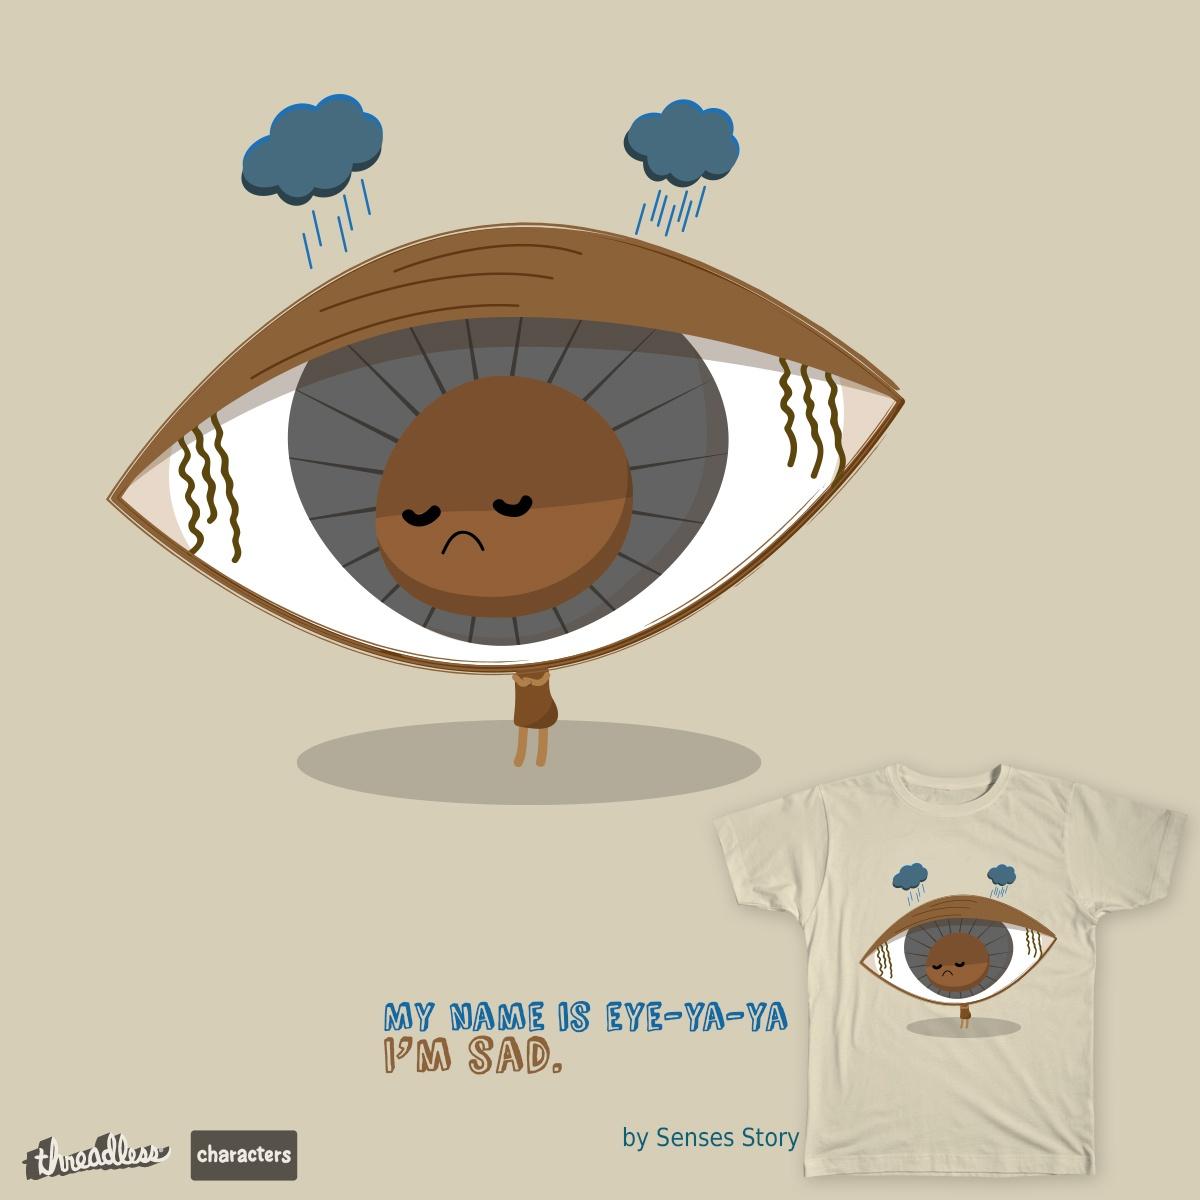 Sad eye by Poeyze on Threadless